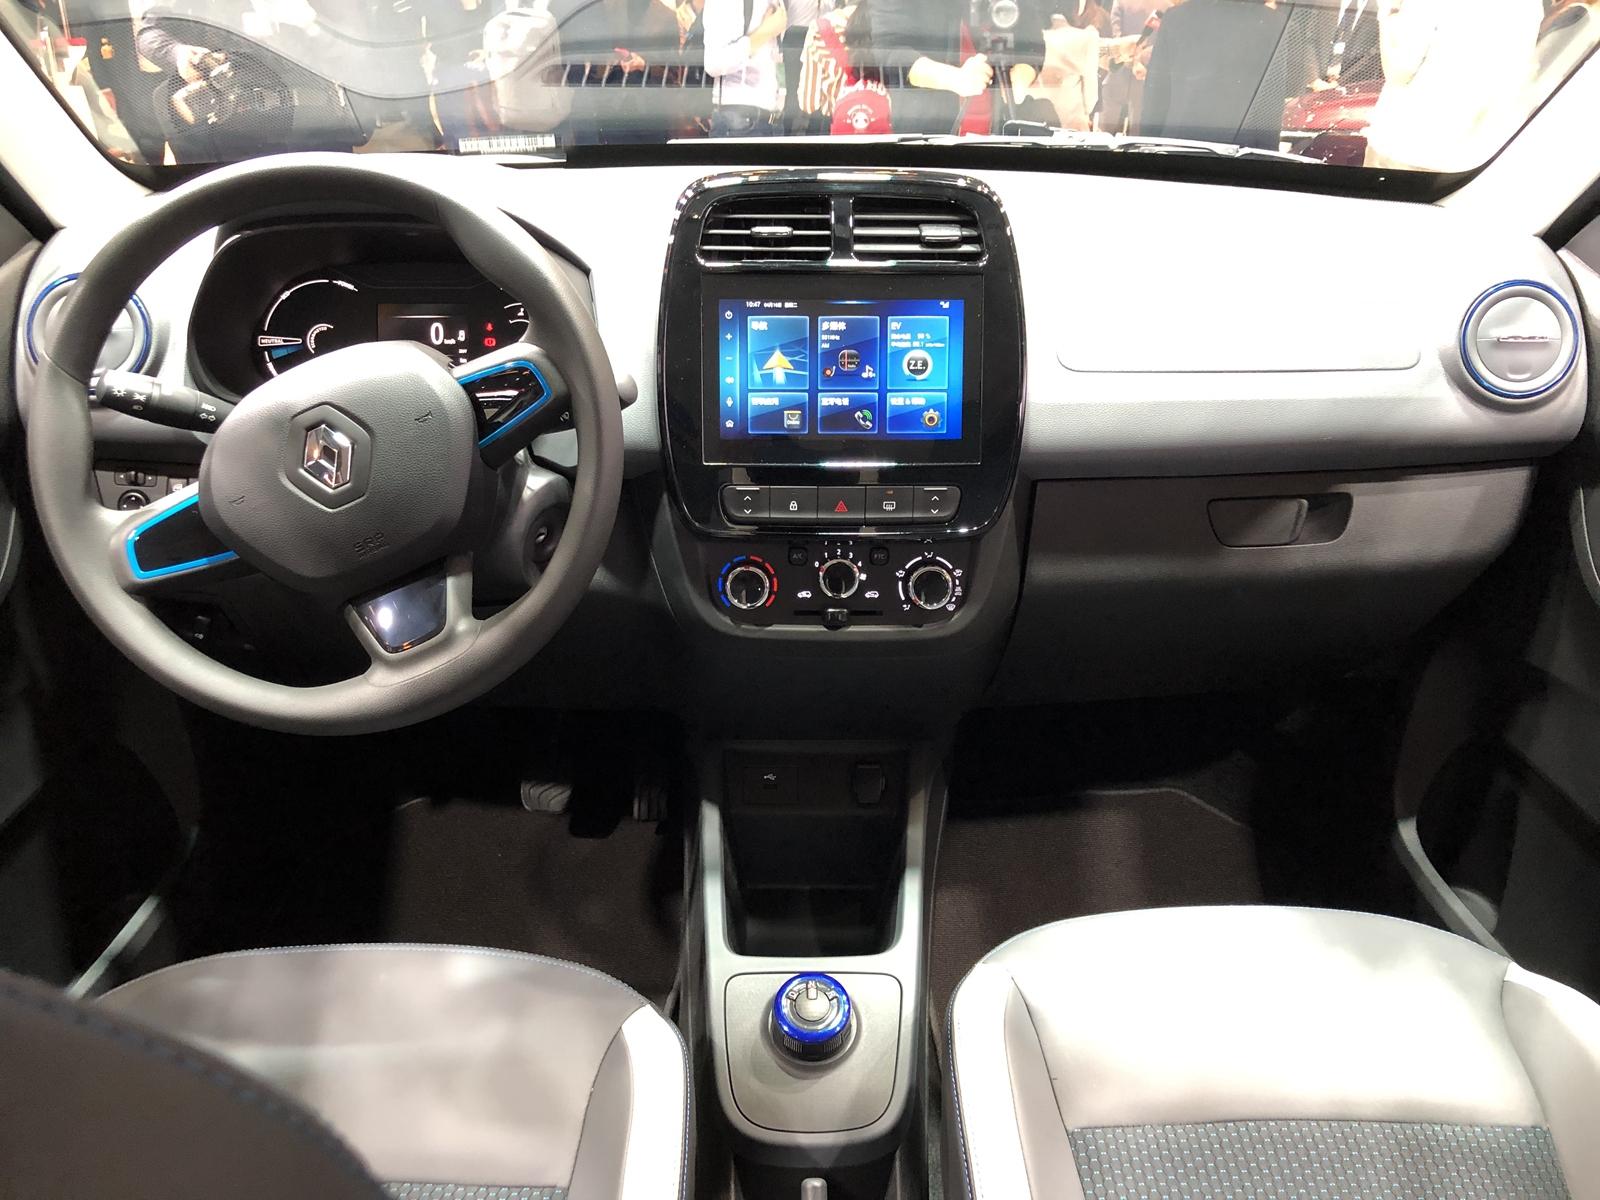 2015 - [Renault] Kwid [BBA] (Inde) [BBB] (Brésil) - Page 32 6b4c3e047fb24c4195f75351b89d1a73